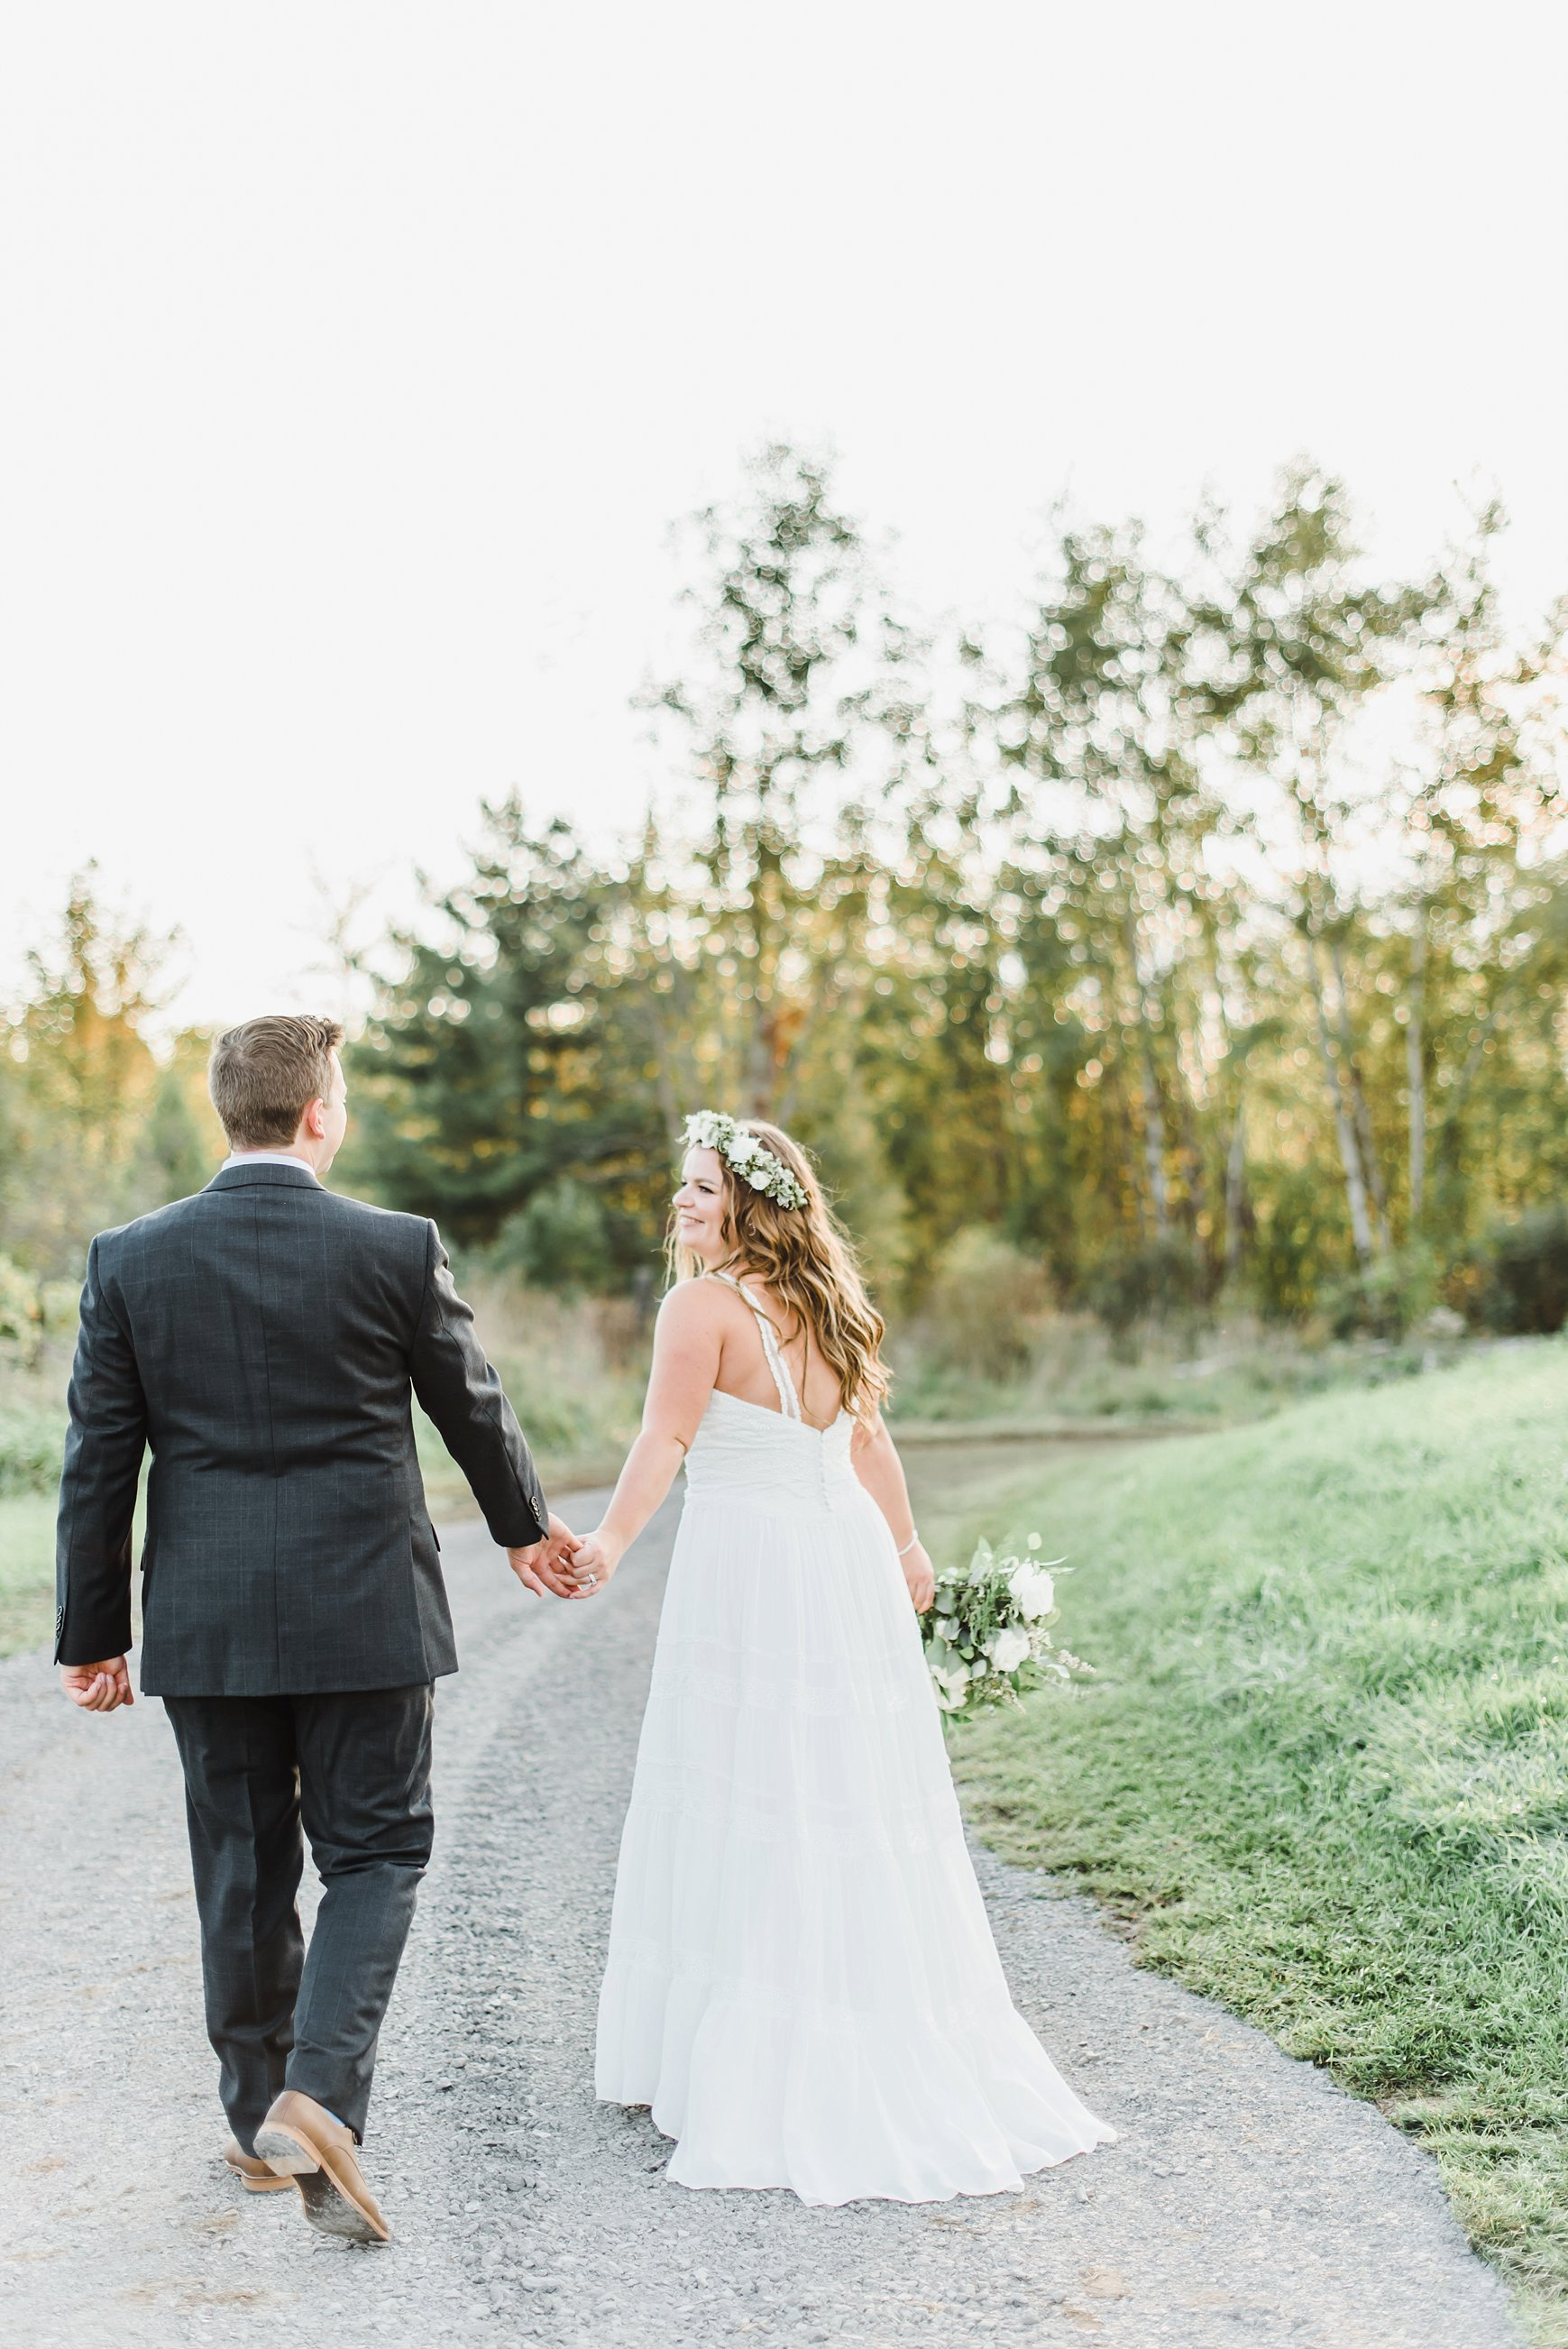 light airy indie fine art ottawa wedding photographer | Ali and Batoul Photography_1201.jpg